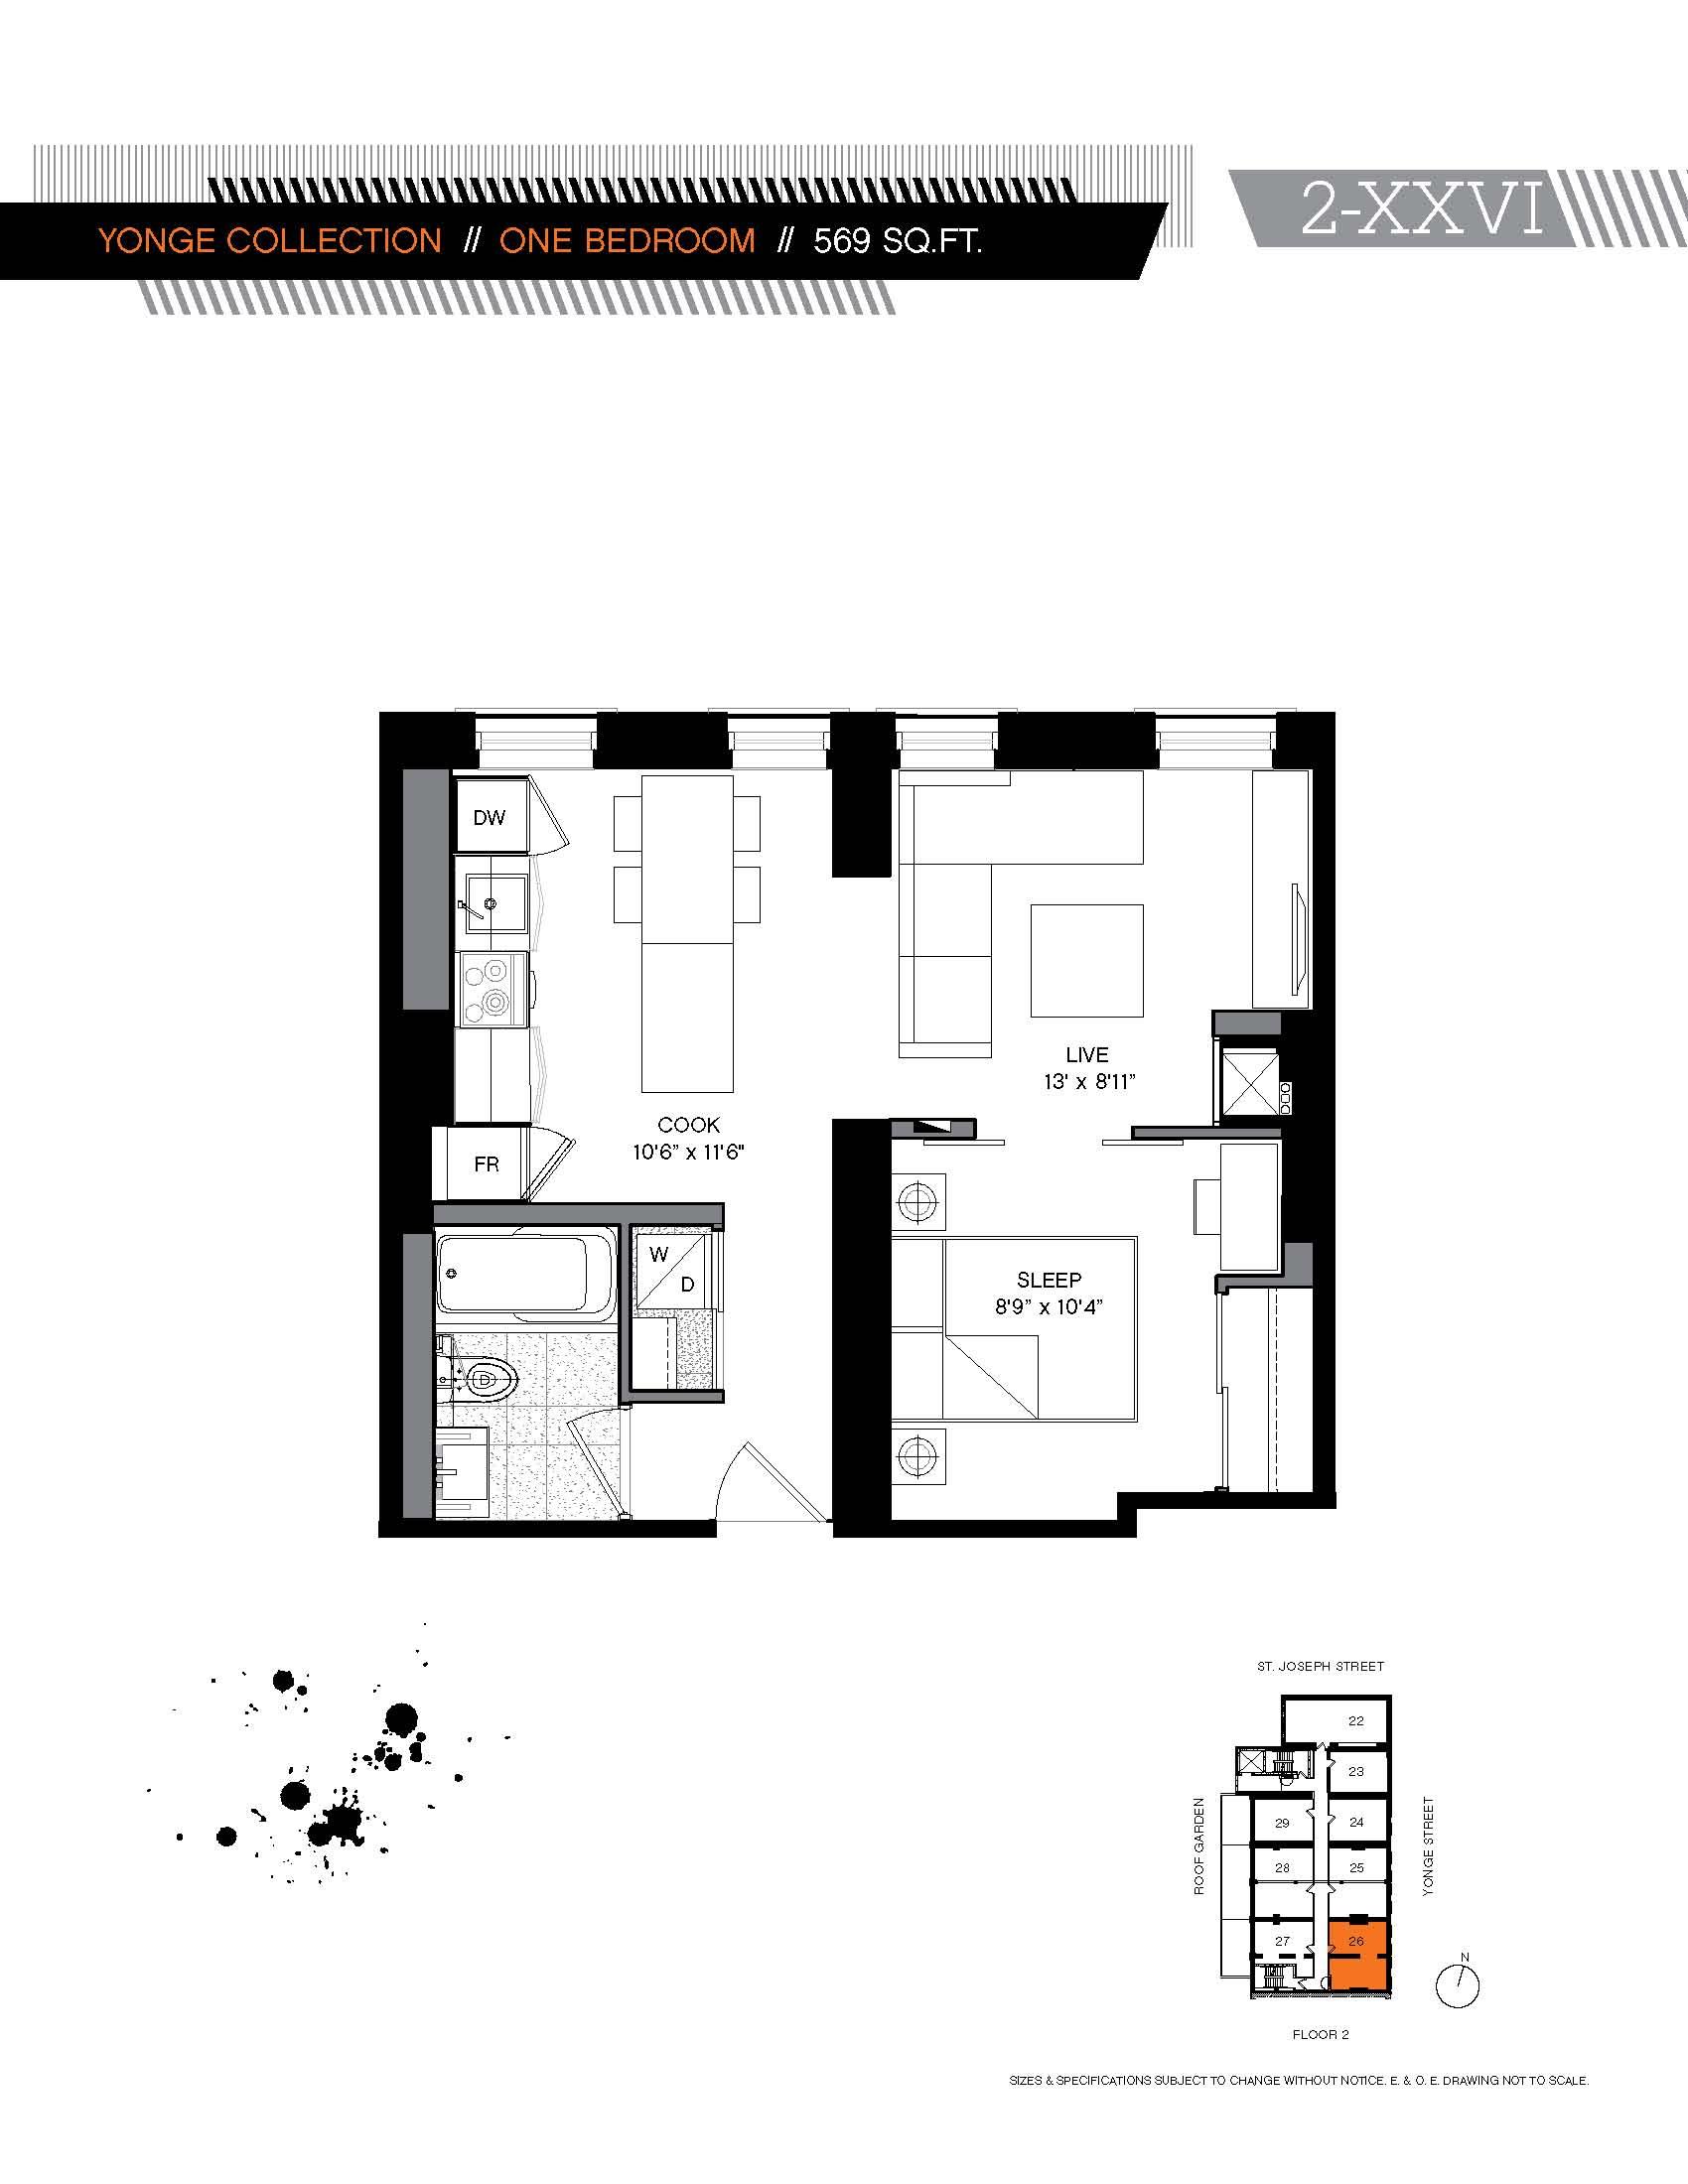 Five yonge collection 1bdr five condos at 5 st joseph for 12 yonge floor plans